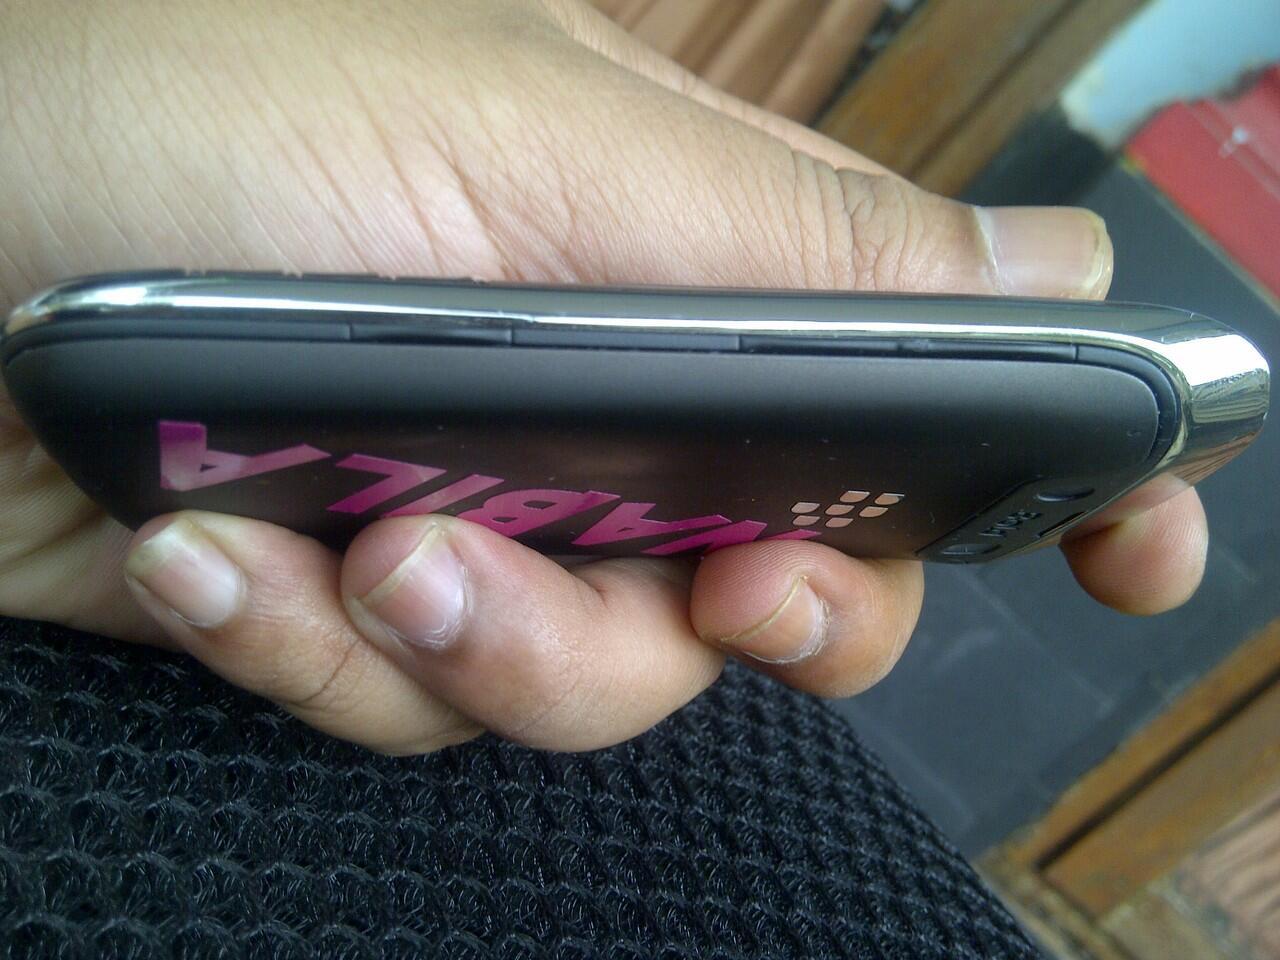 JUAL BLACKBERRY BELLAGIO 9790 BLACK Buka iphone,samsung,android